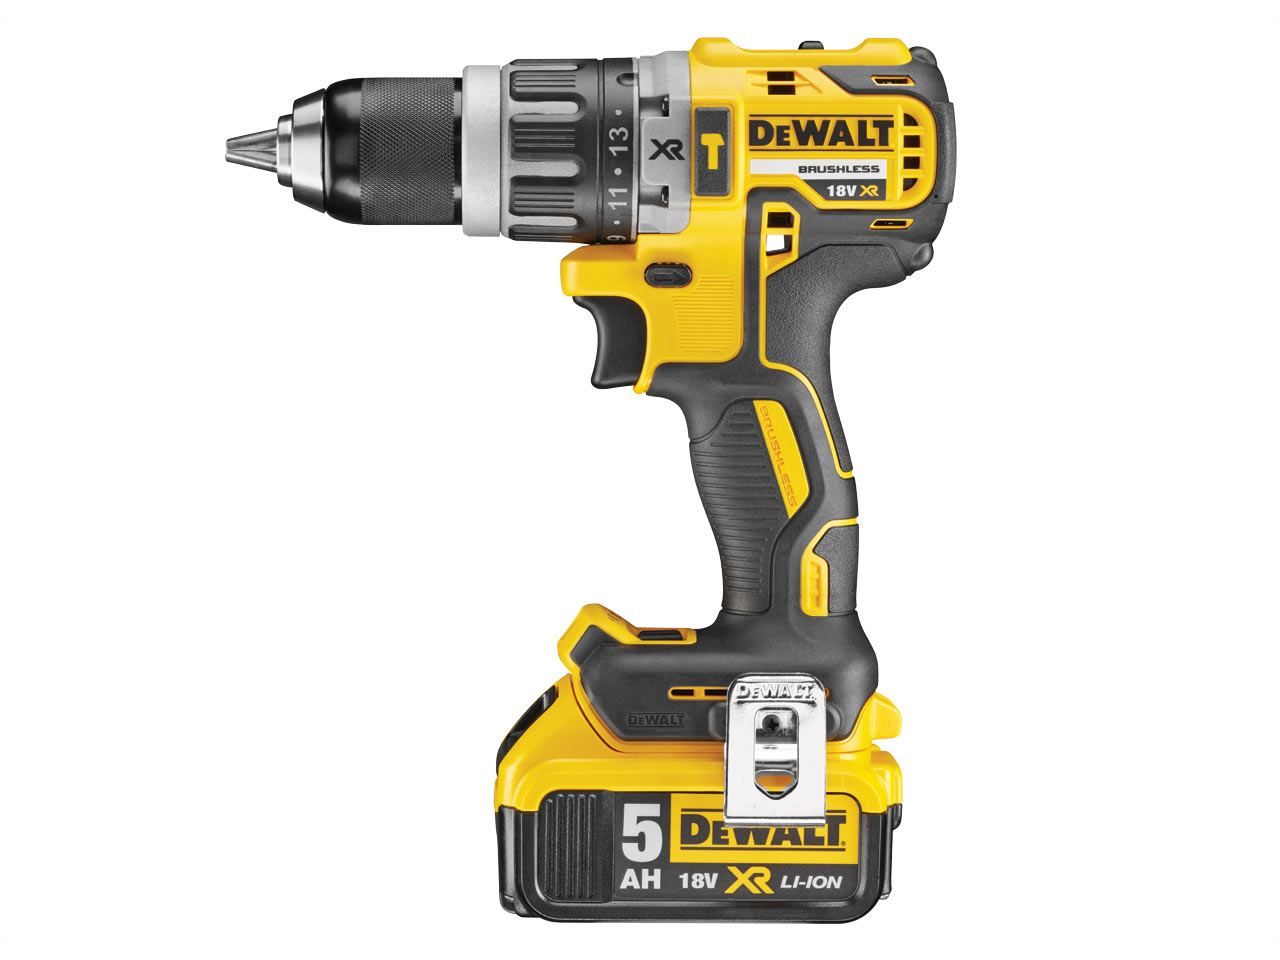 Dewalt DCD796P2 18V XR Brushless Combi Drill with 2x 5.0Ah